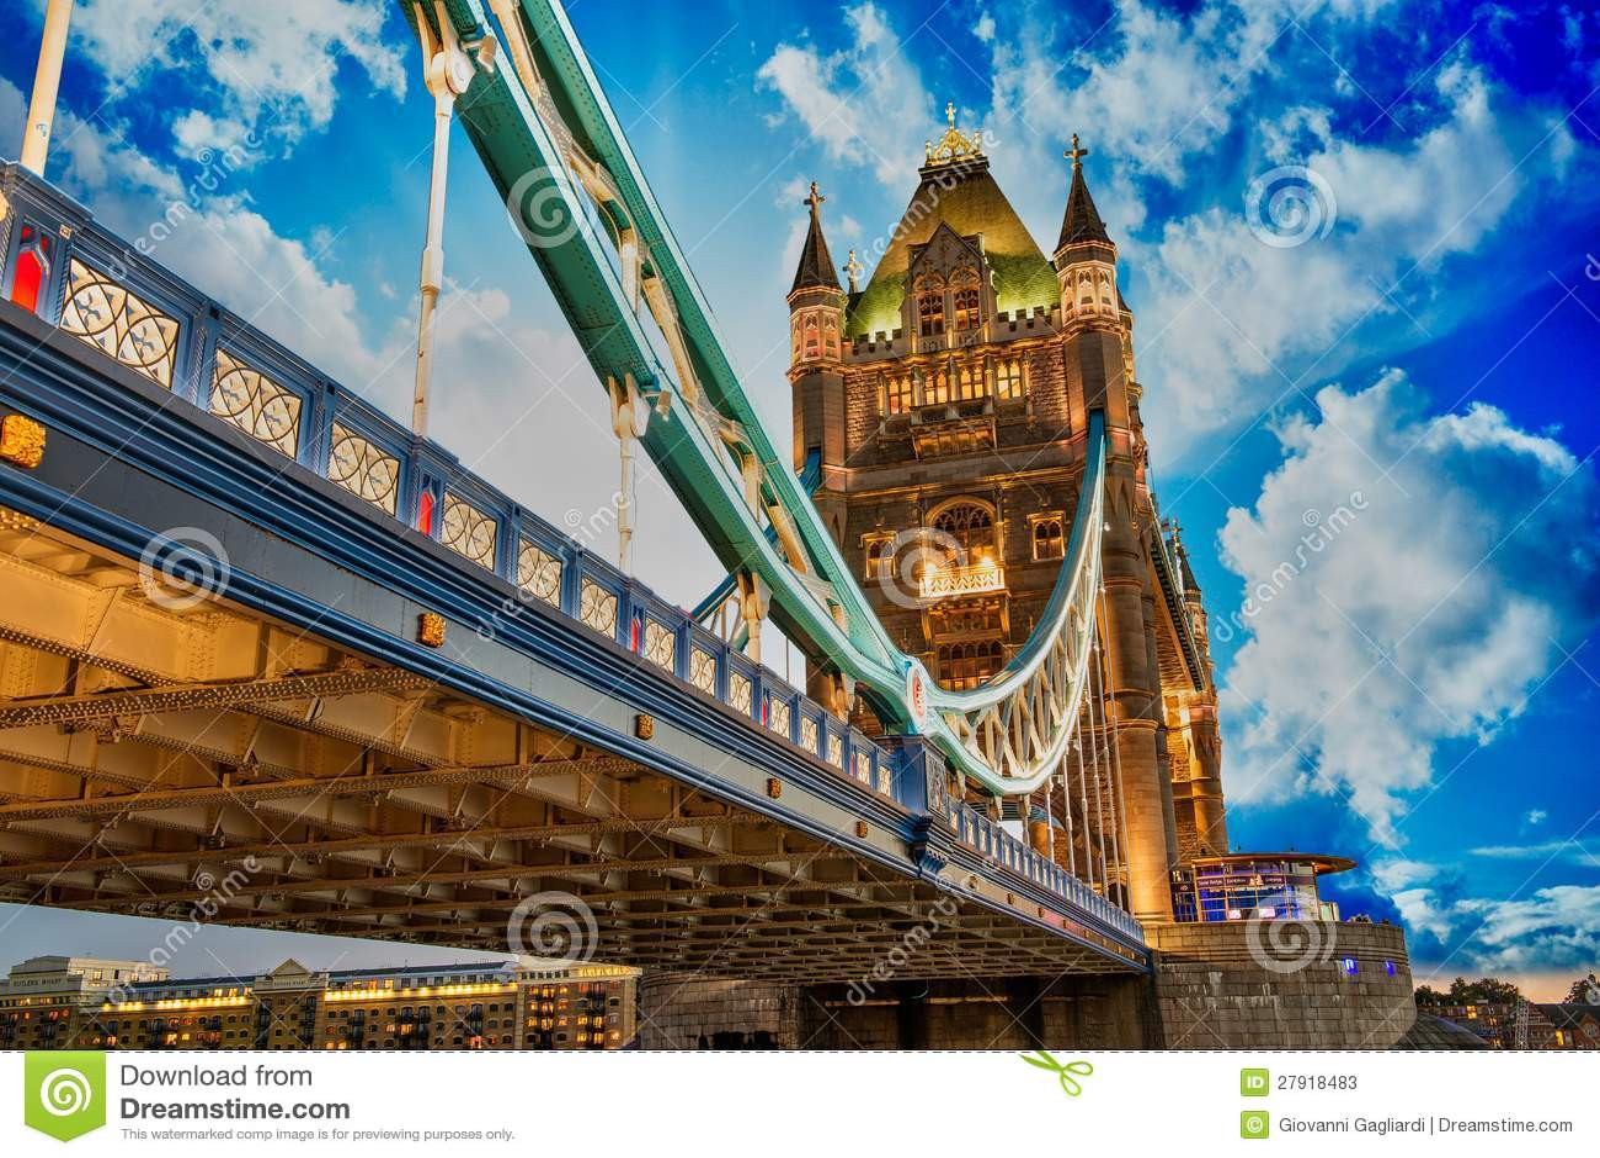 Schöne Leuchten Der Kontrollturm Brücke In London Stockbild Bild